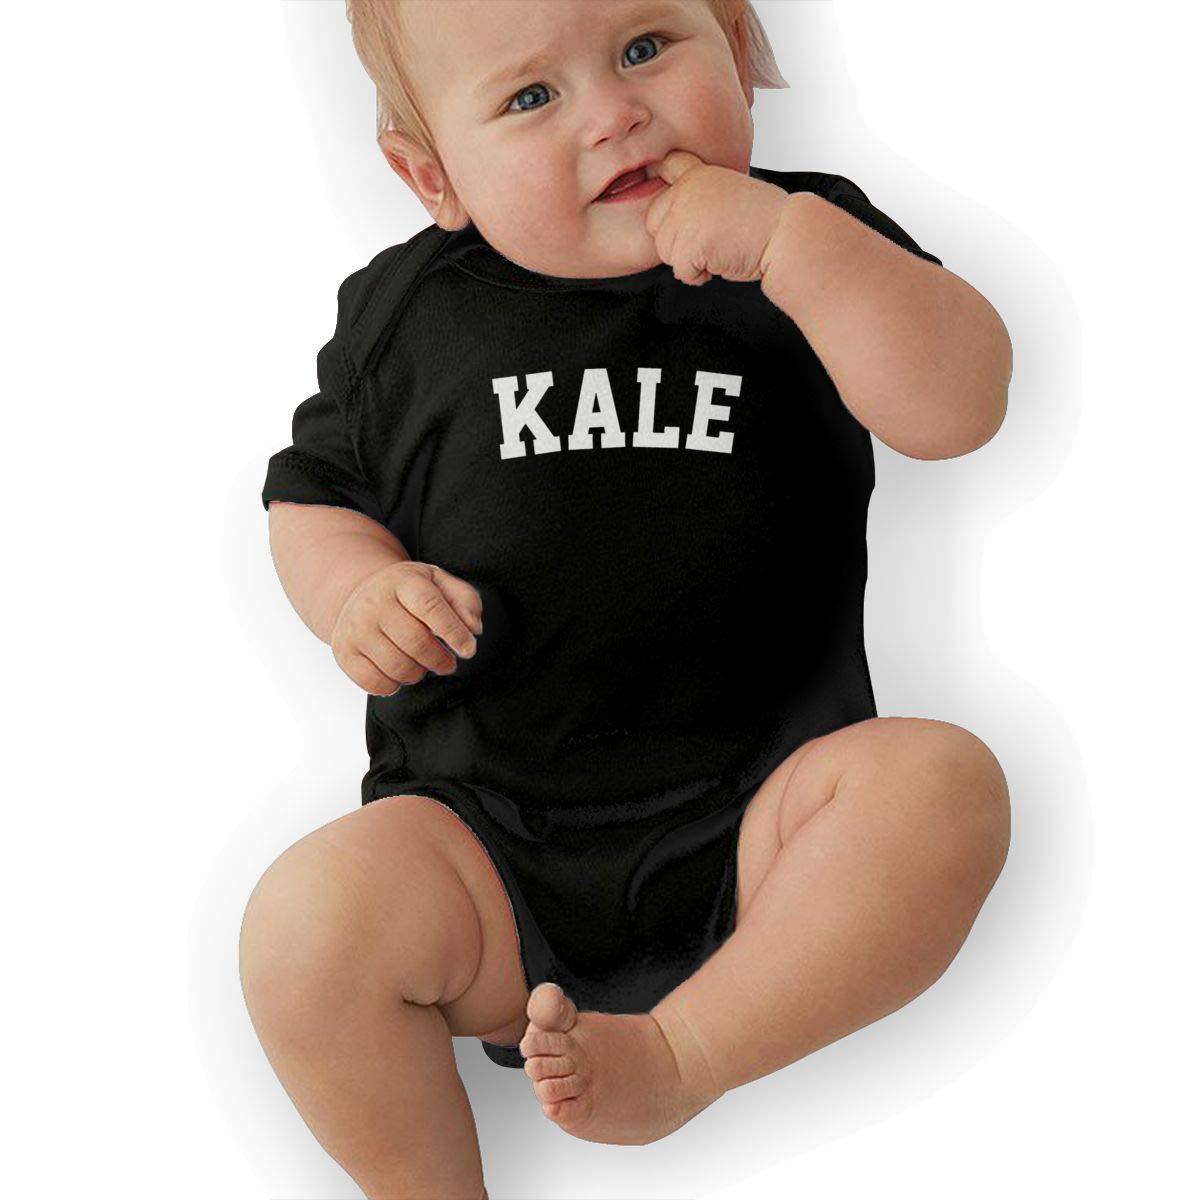 Xuforget Womens Kale Babys Boys /& Girls Short Sleeve Bodysuit Babys